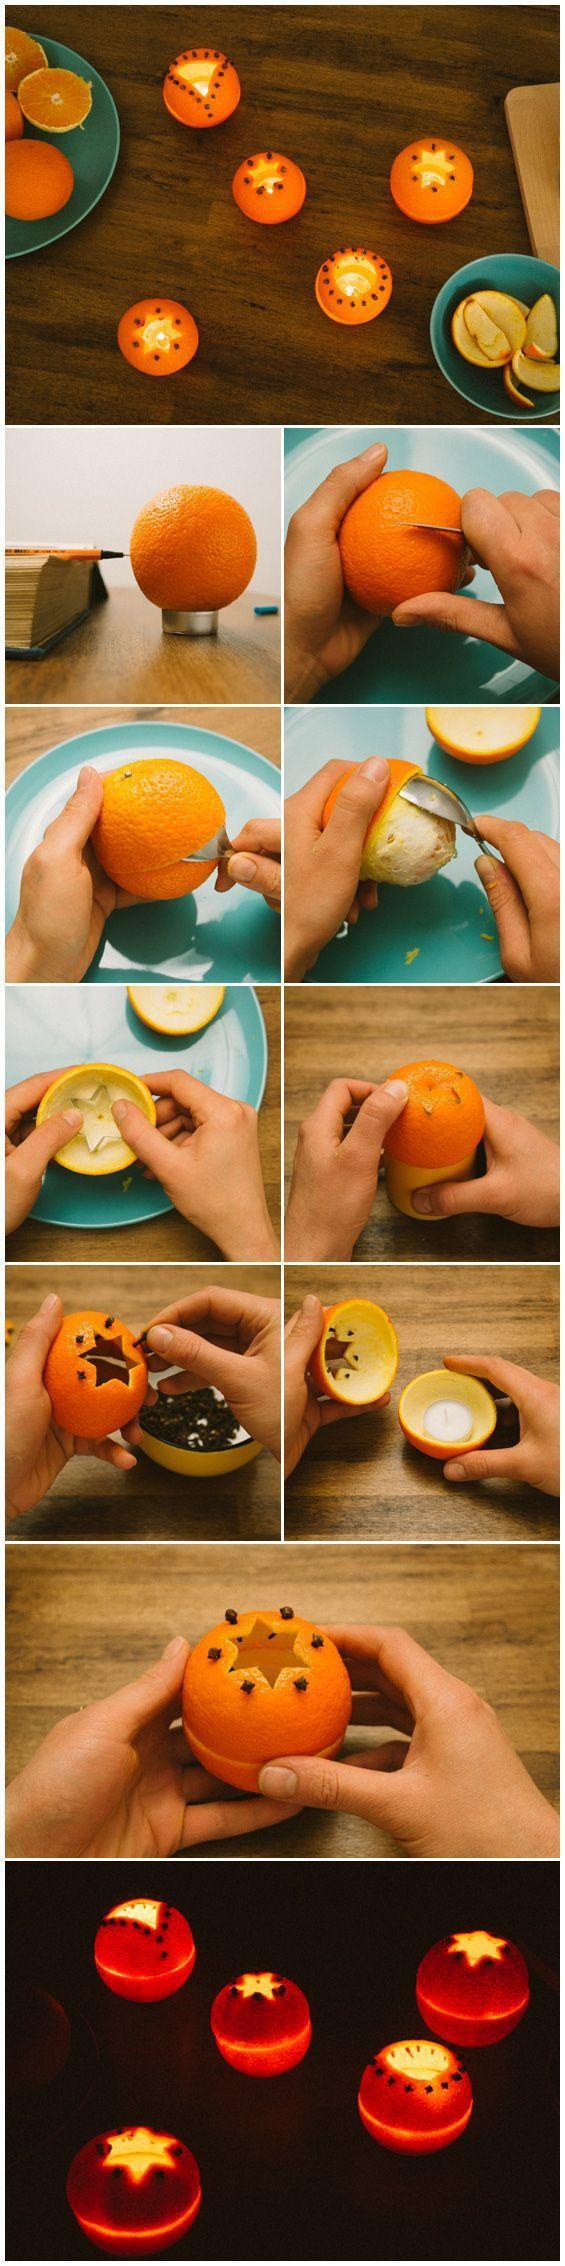 25 best ideas about centros de mesa naranja en pinterest - Ambientador casero limon ...